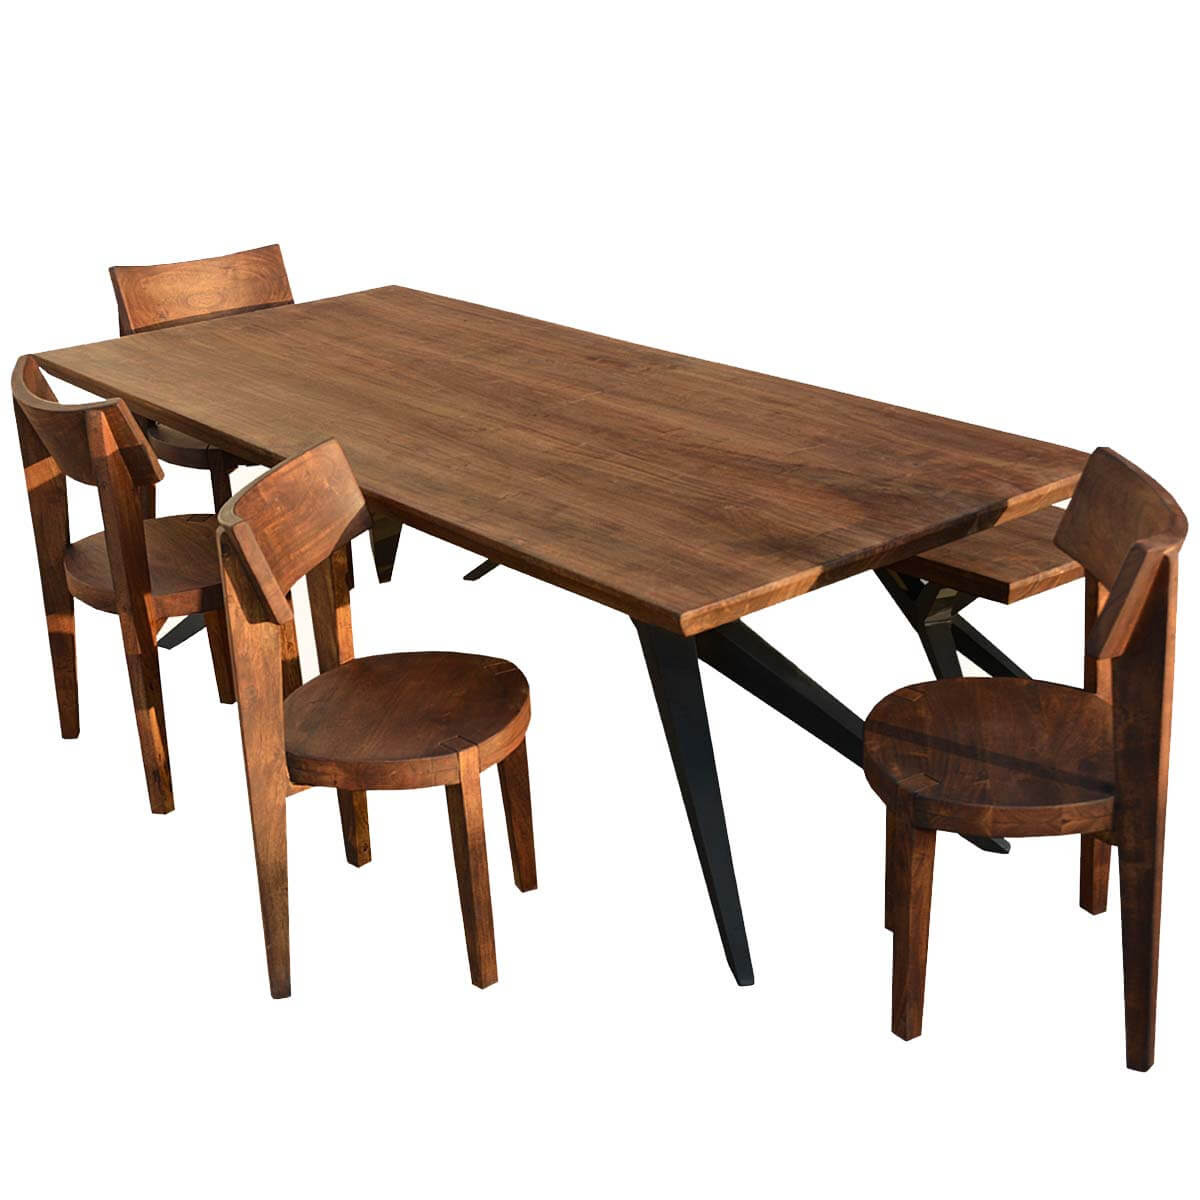 Unique Rustic Urban Loft Industrial Dining Table & Chair ...